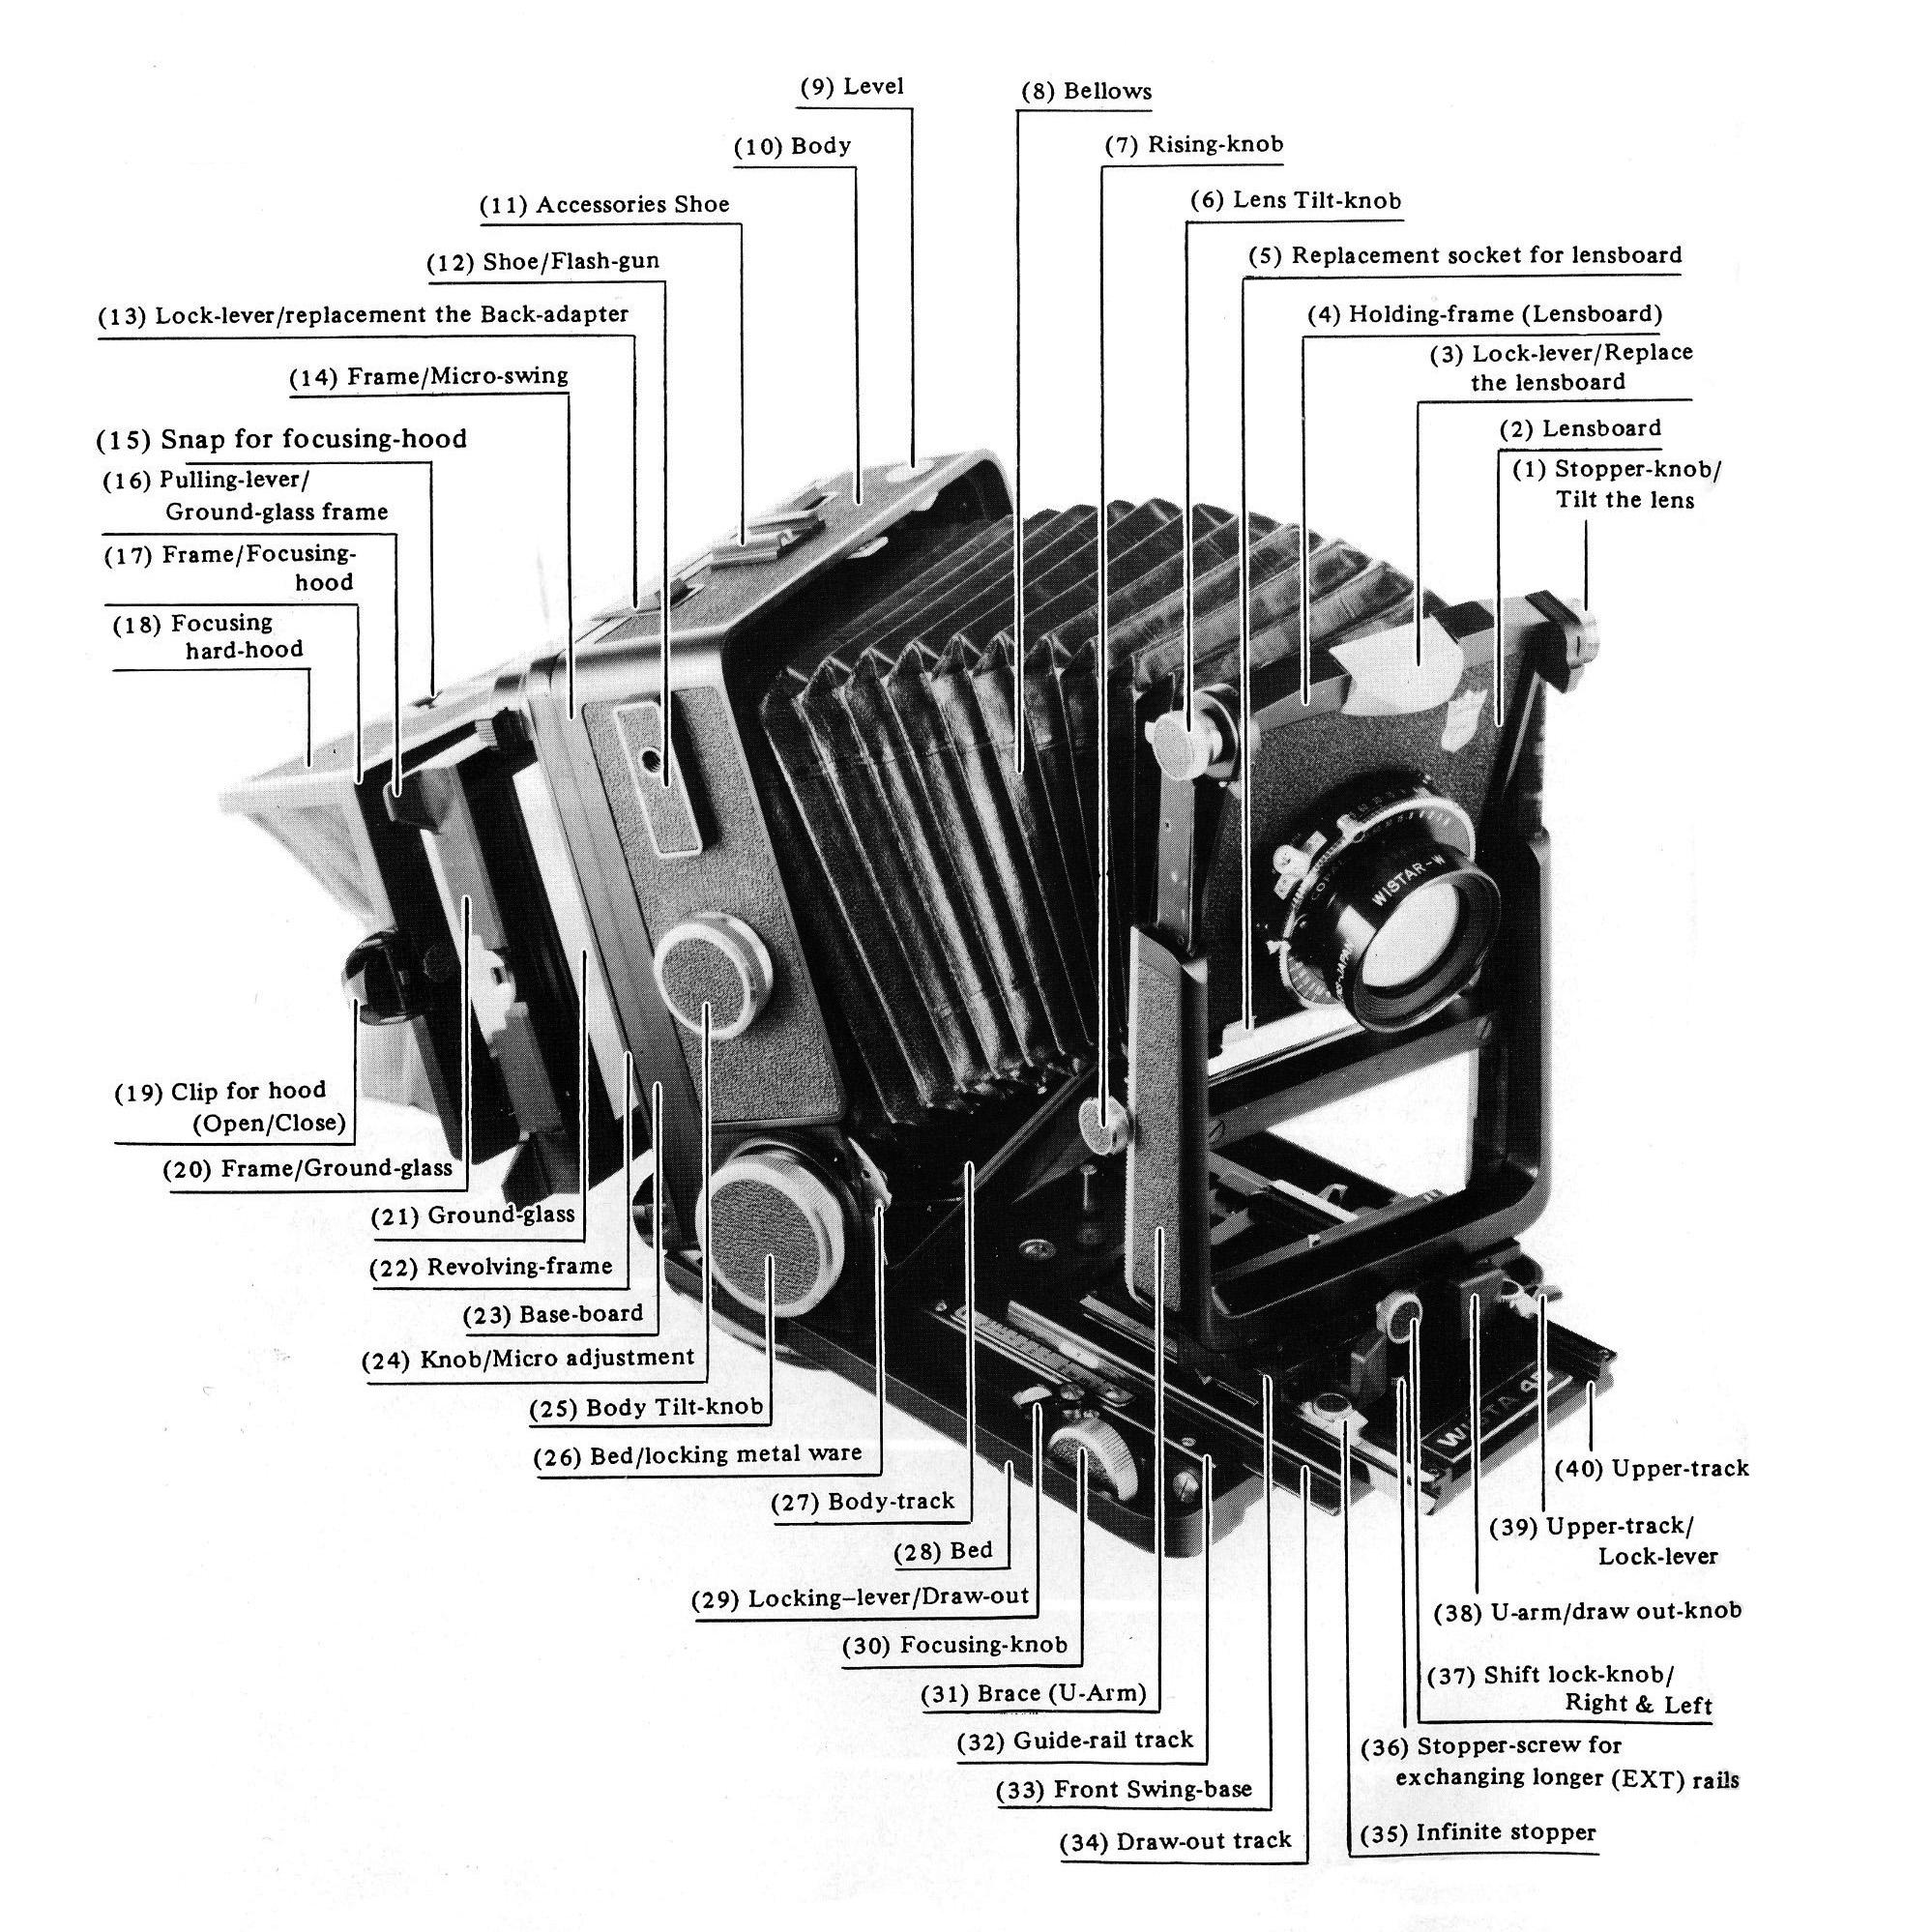 Wista 45 SP/VX Manual — Infocast.nl